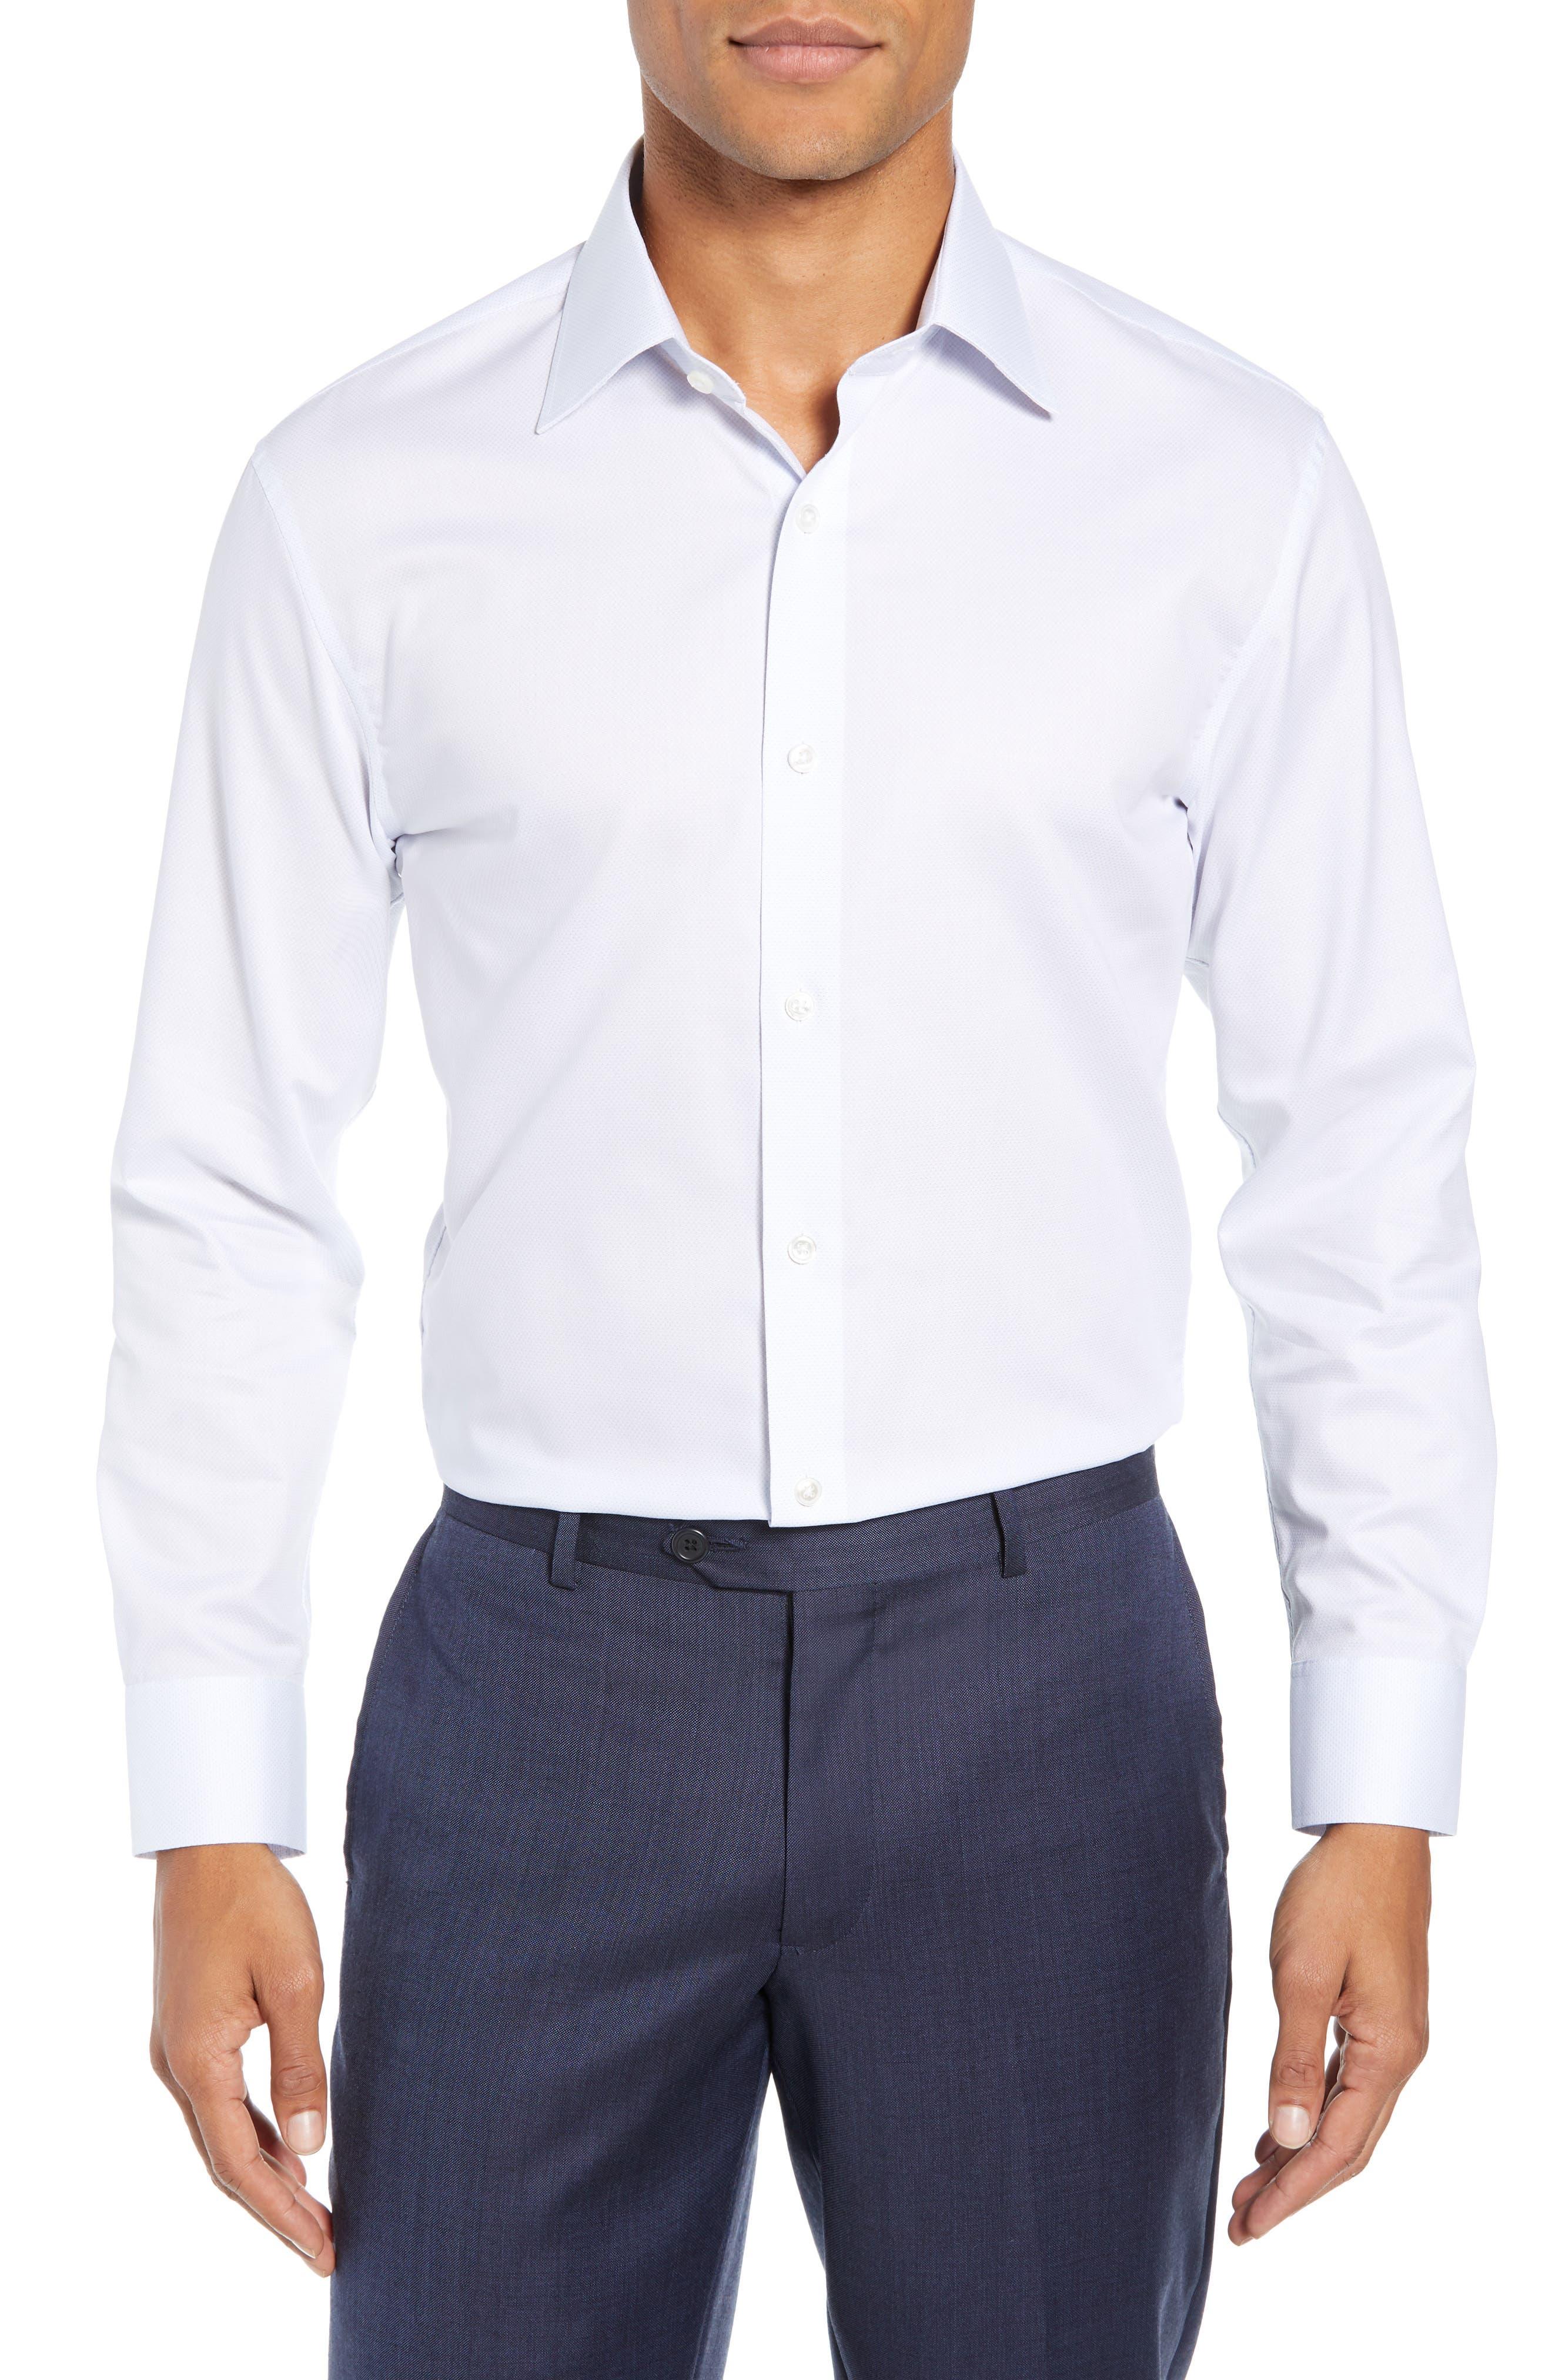 Swiss Performance Slim Fit Solid Dress Shirt,                             Main thumbnail 1, color,                             SOFT BLUE